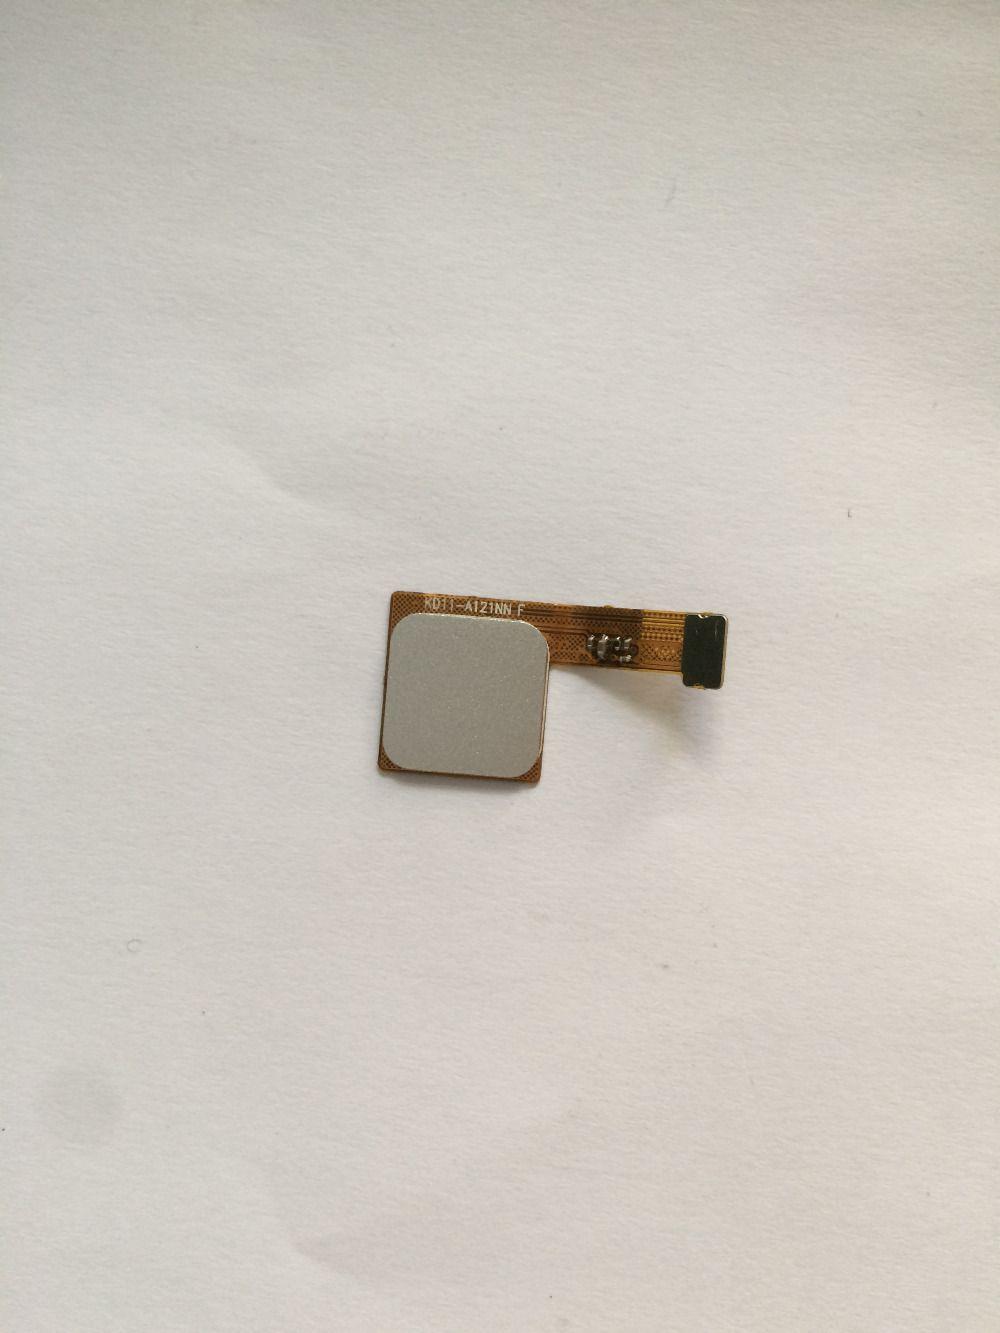 Used  Fingerprint Sensor Button For Umi Max 5.5 FHD MTK6755M Octa Core 1920*1080 Free Shipping